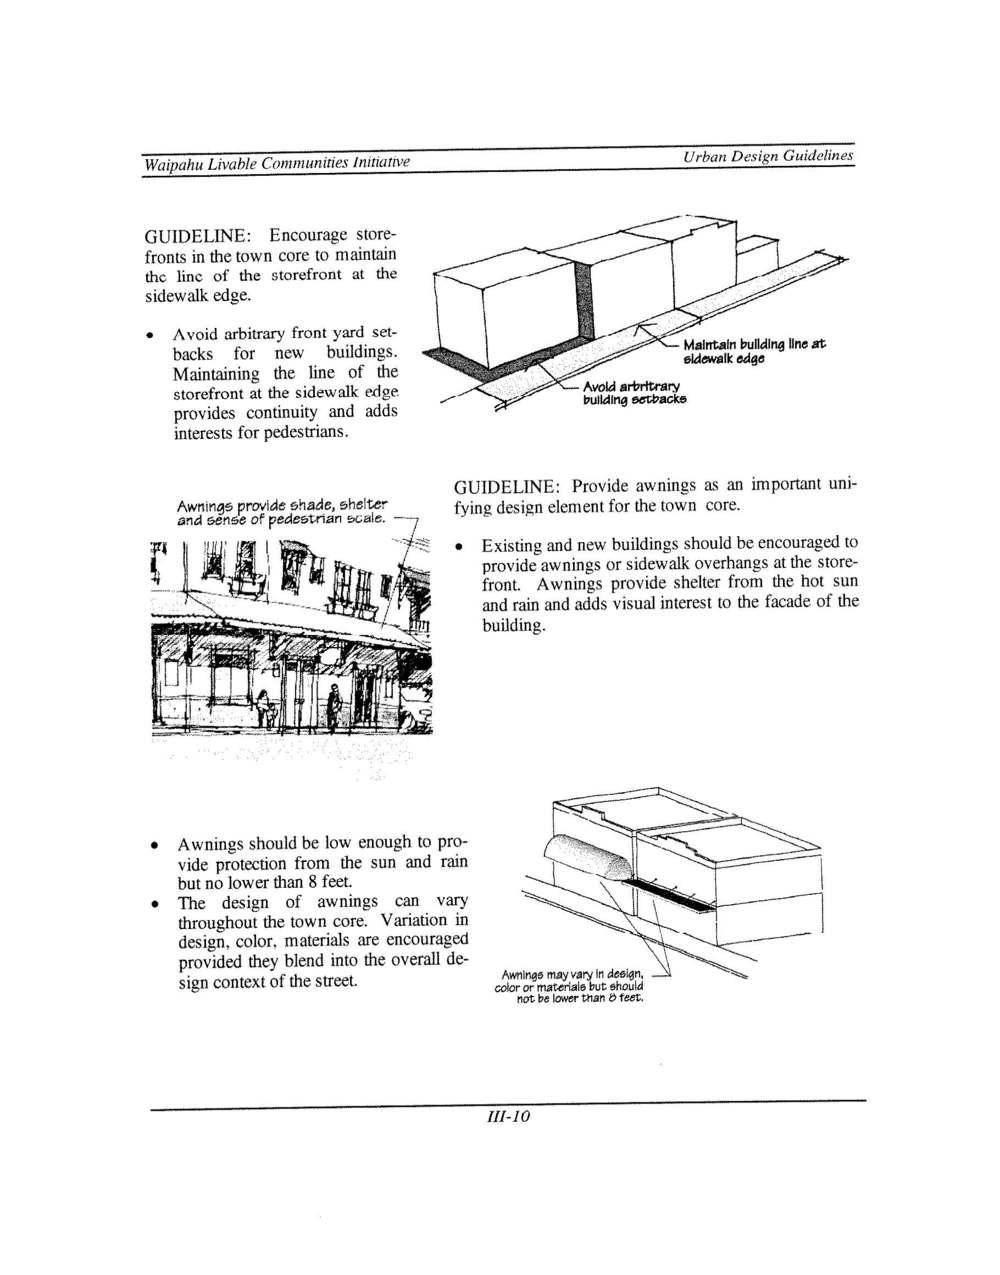 160531_WaipahuLivableCommunities(1998)_Page_100.jpg